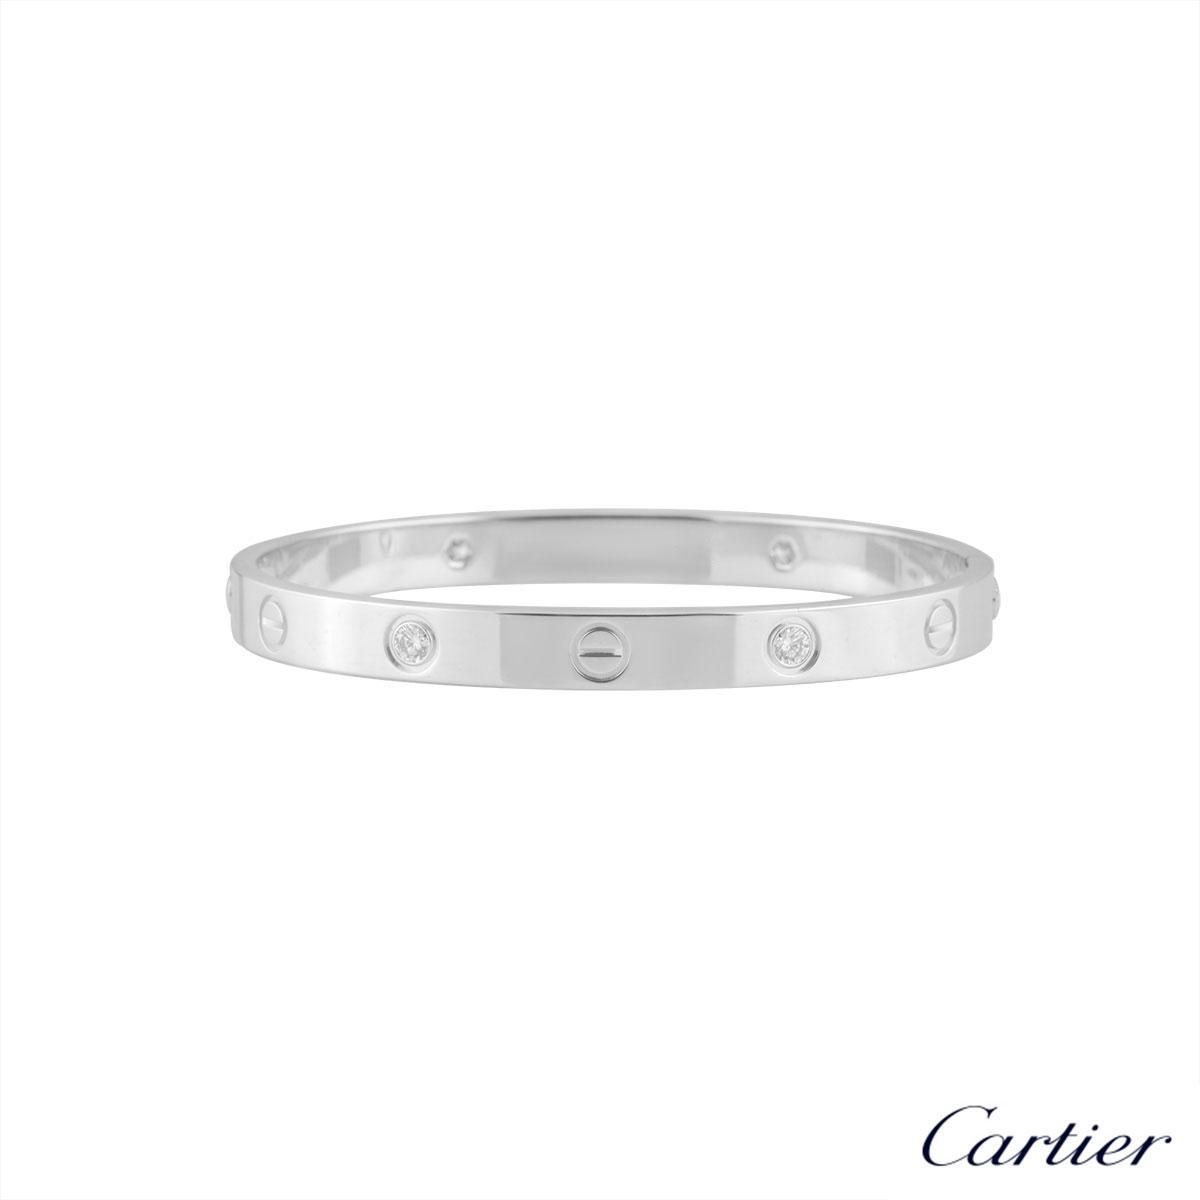 Cartier White Gold Half Diamond Love Bracelet Size 17 B6035817